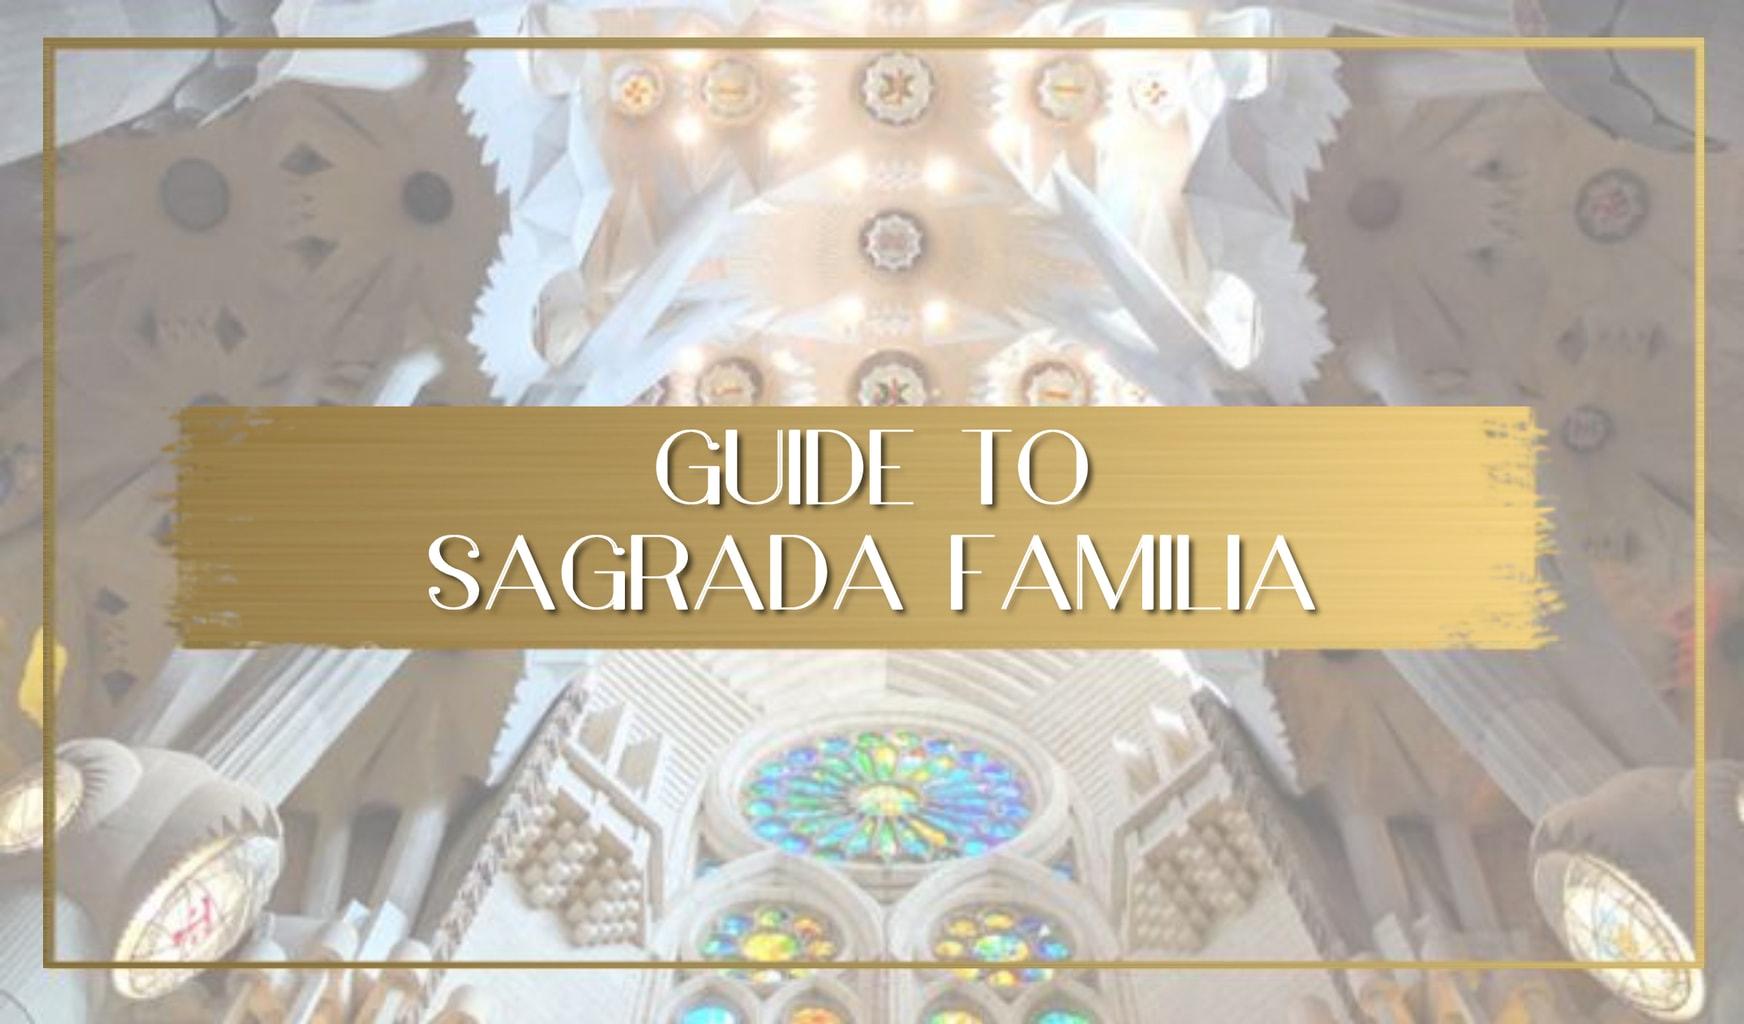 Guide to Sagrada Familia main